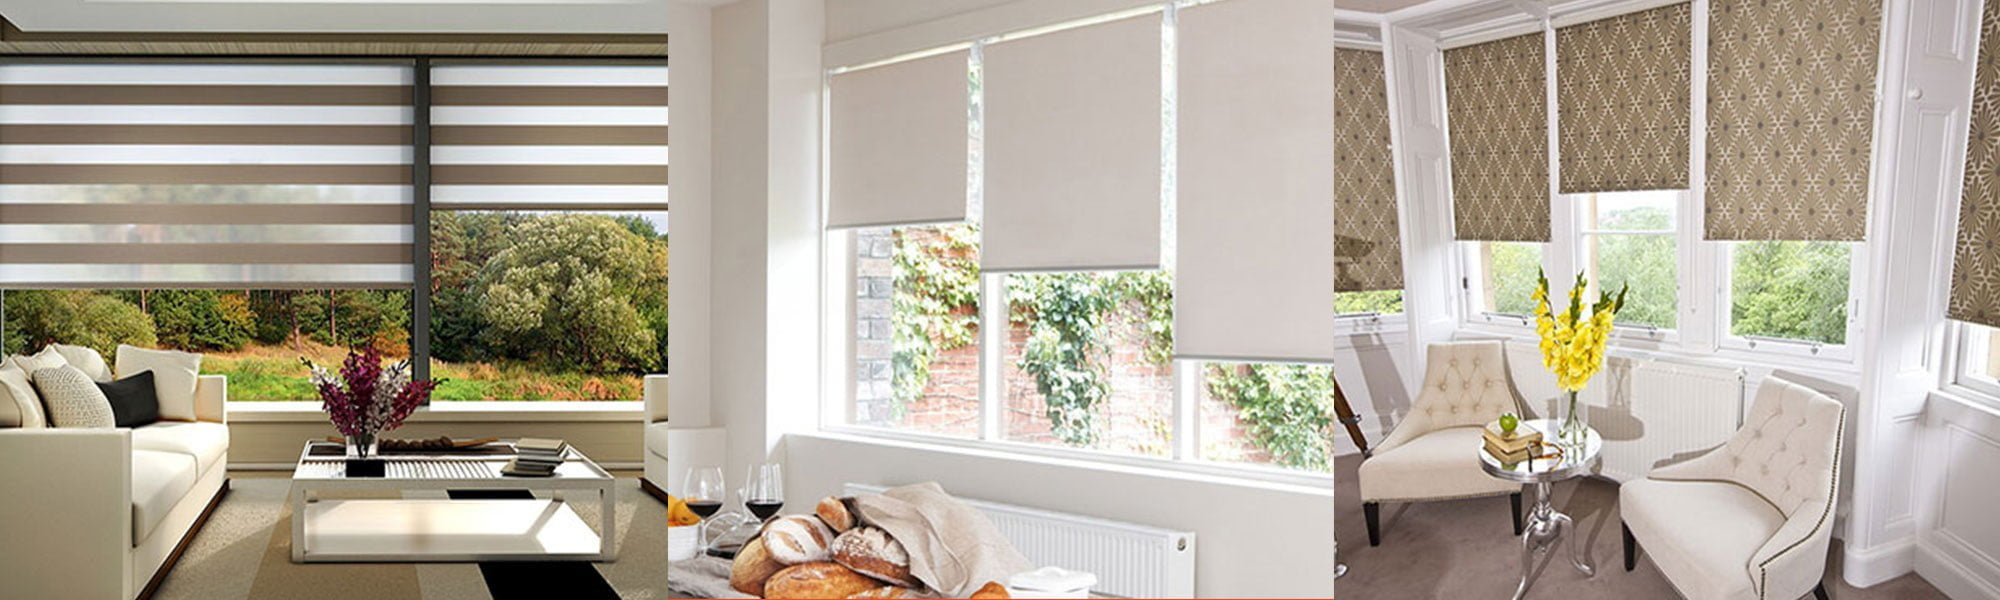 bbg blinds curtains